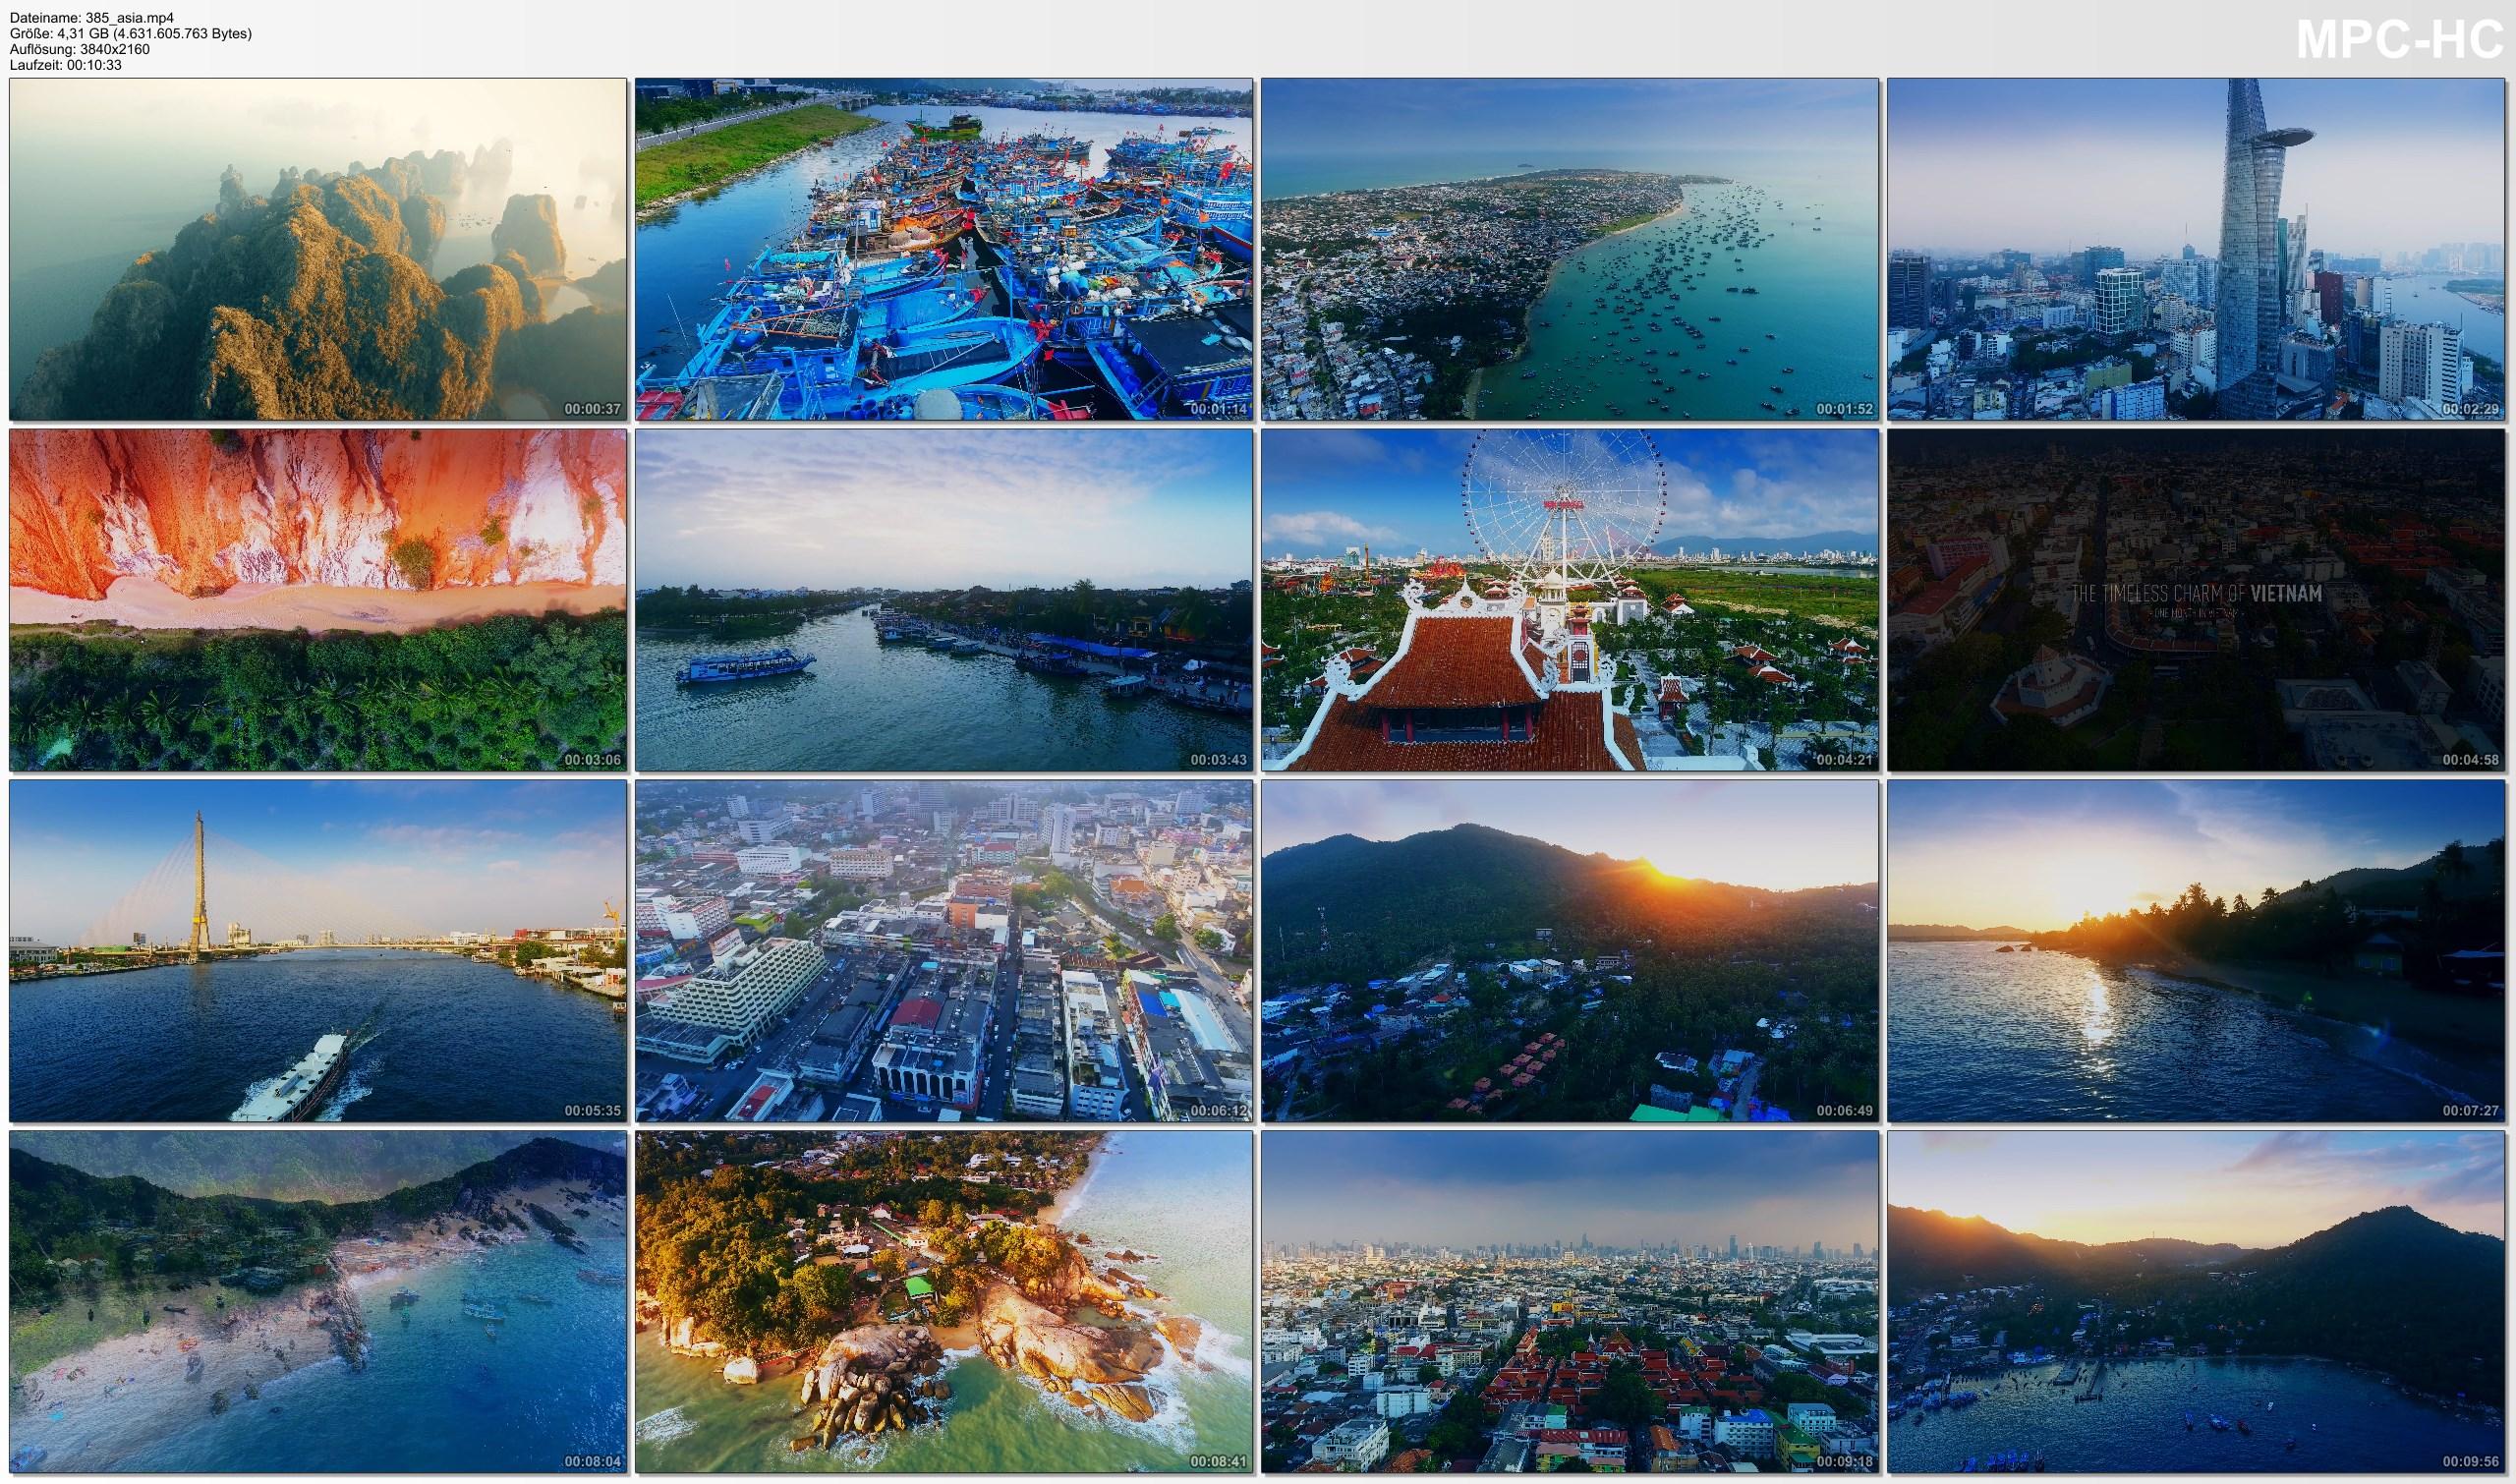 Drone Pictures from Video 【4K】Drone Footage | Thailand X Vietnam 2019 ..:: Cinematic Aerial | Bangkok Saigon Ko Samui Da Nang